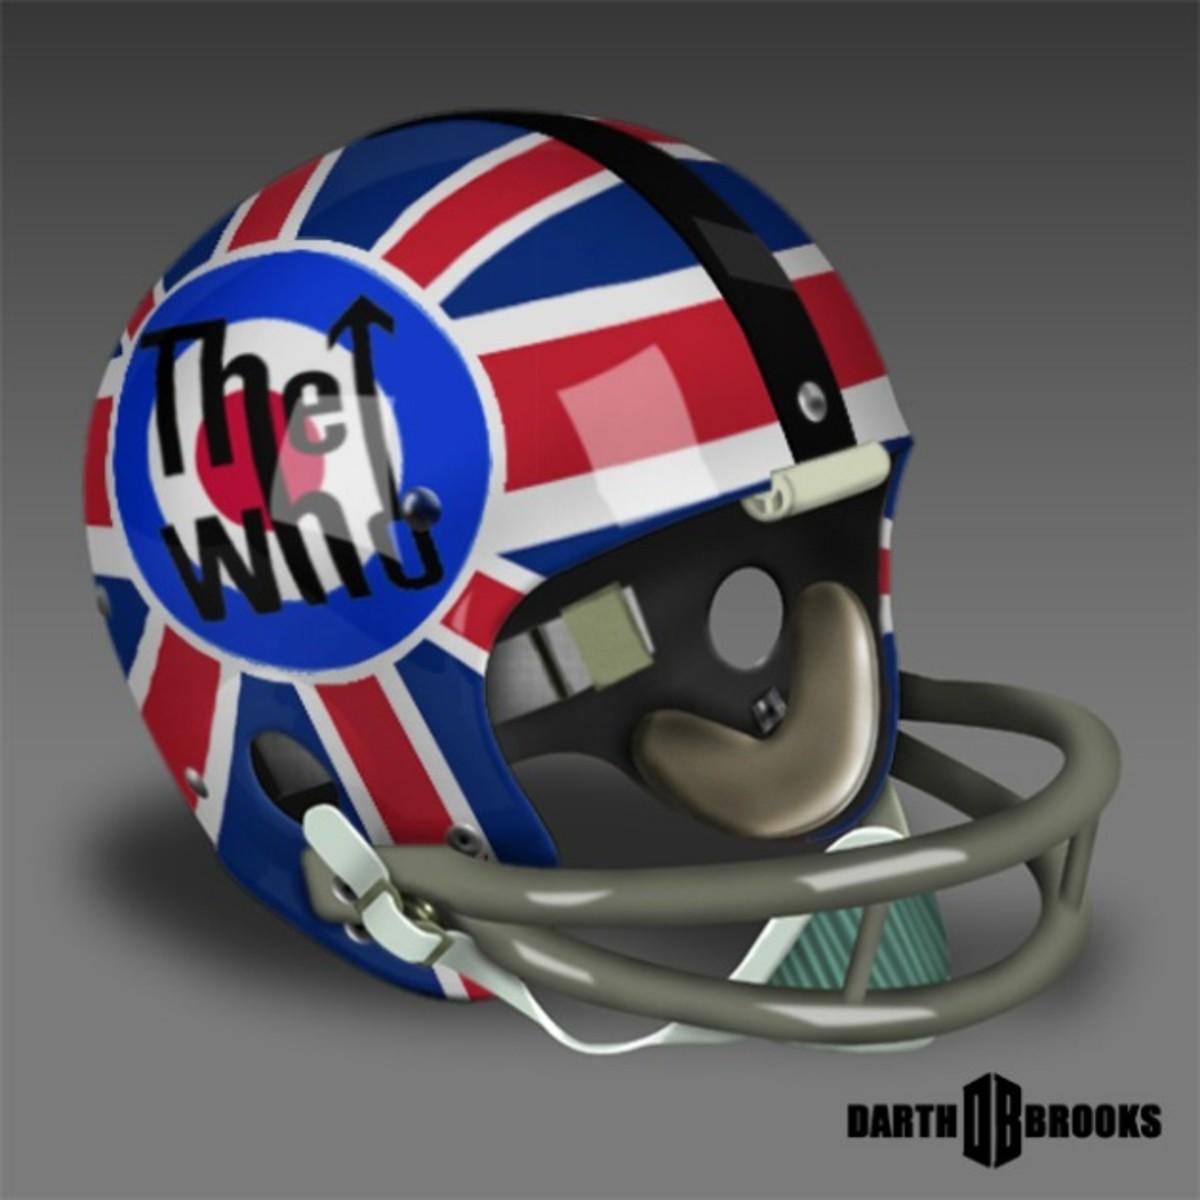 the-who-helmet.jpg